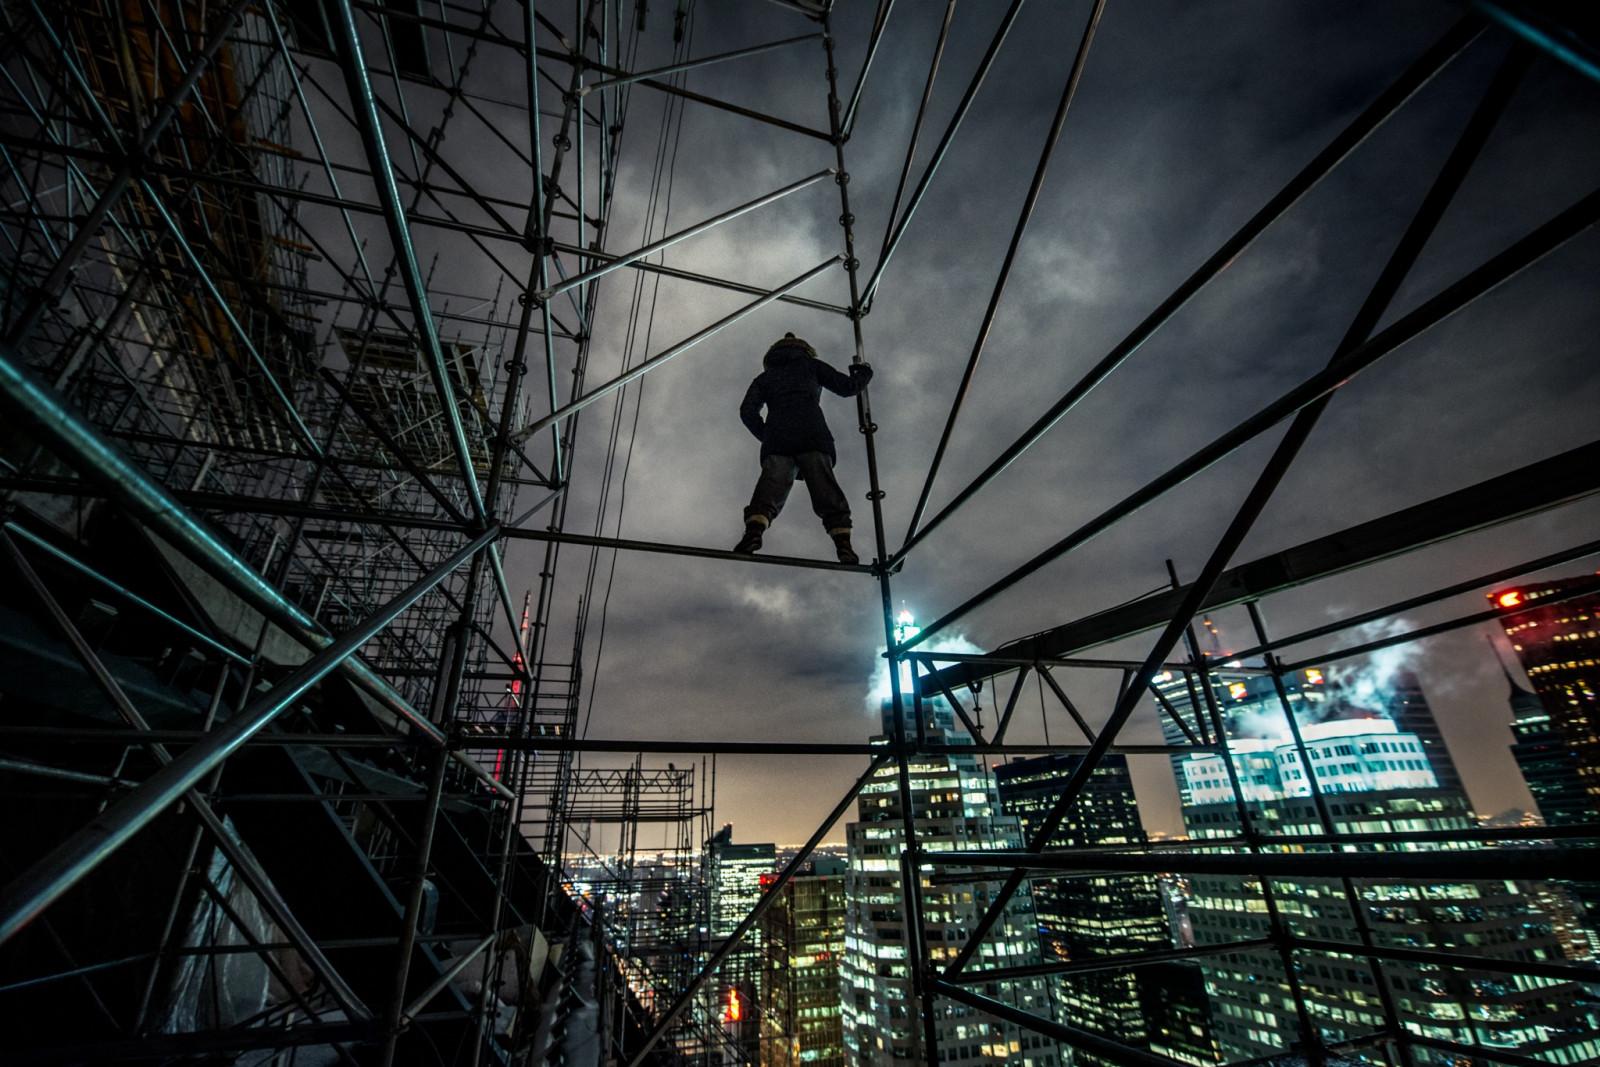 Wallpaper Rooftop Scaffolding Batman Heights